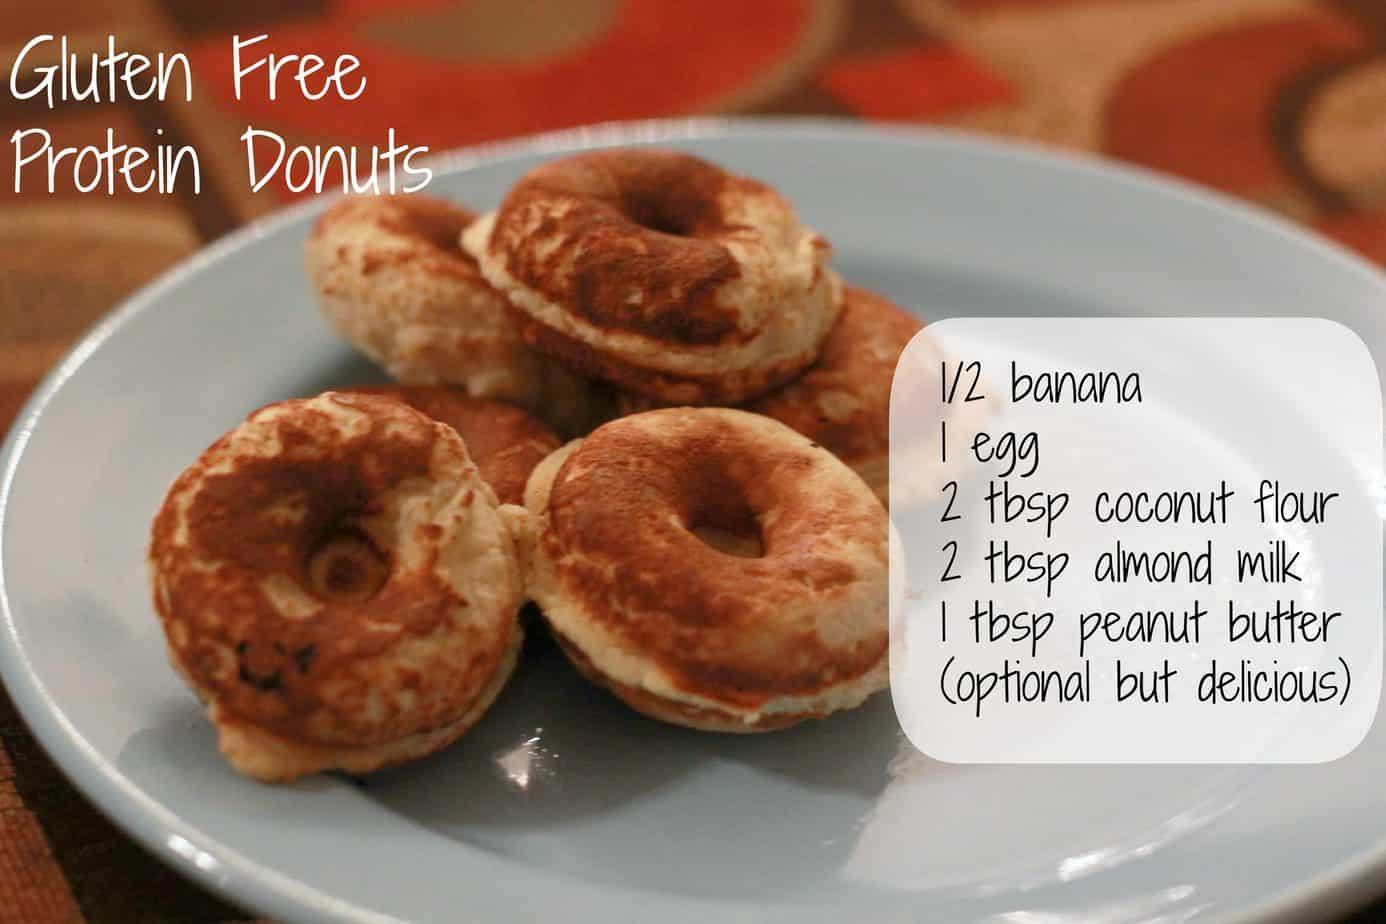 ... gluten free and dairy free gluten free doughnuts offer gluten free